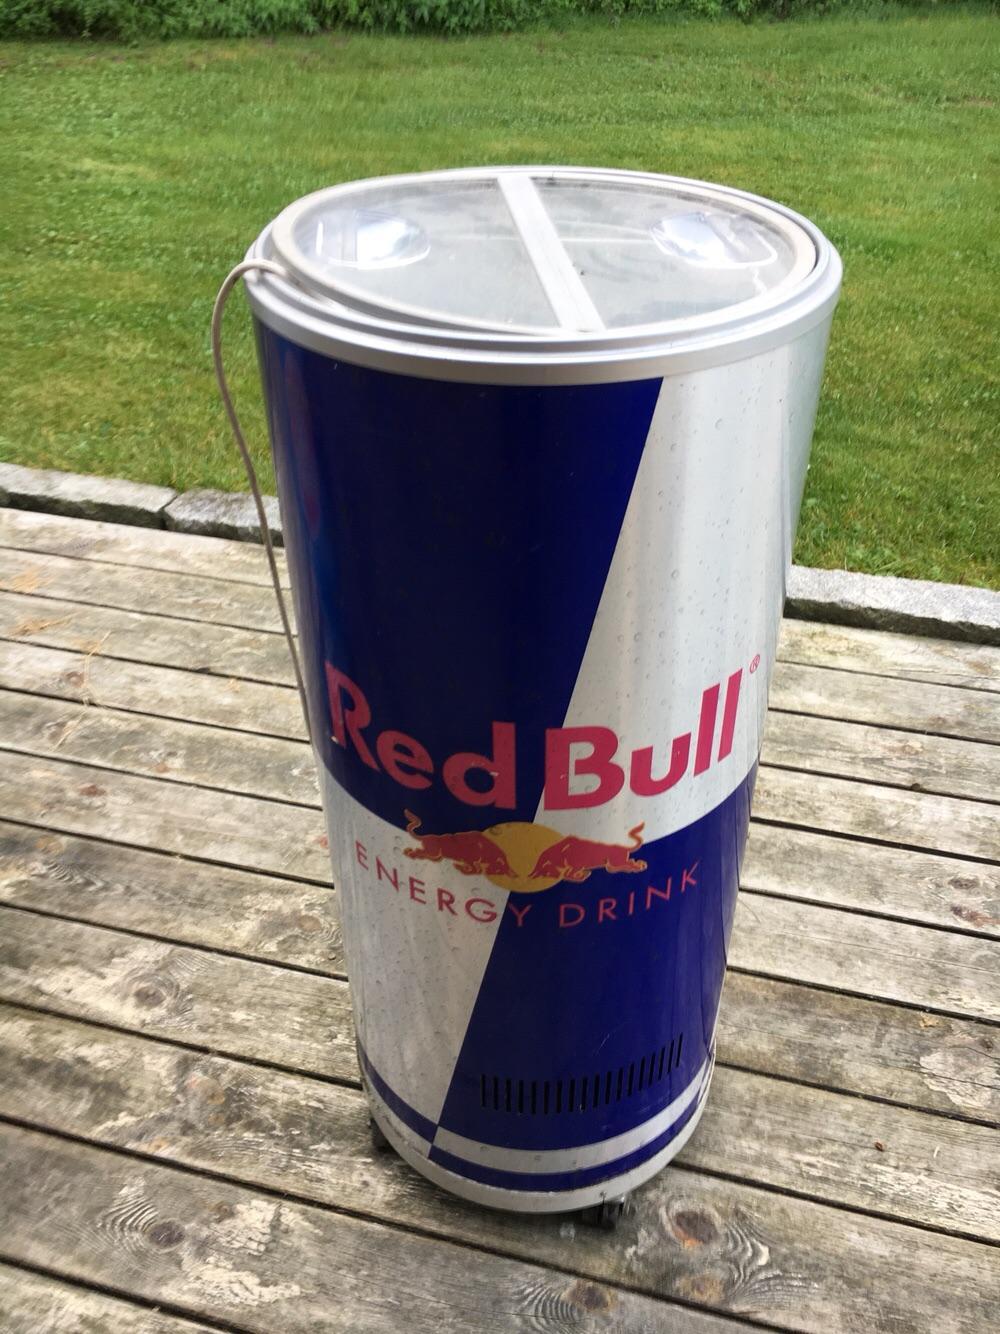 Red Bull Kühlschrank In Dosenform : Red bull kühlschrank in dosenform: blaupunkt kühlschrank mit